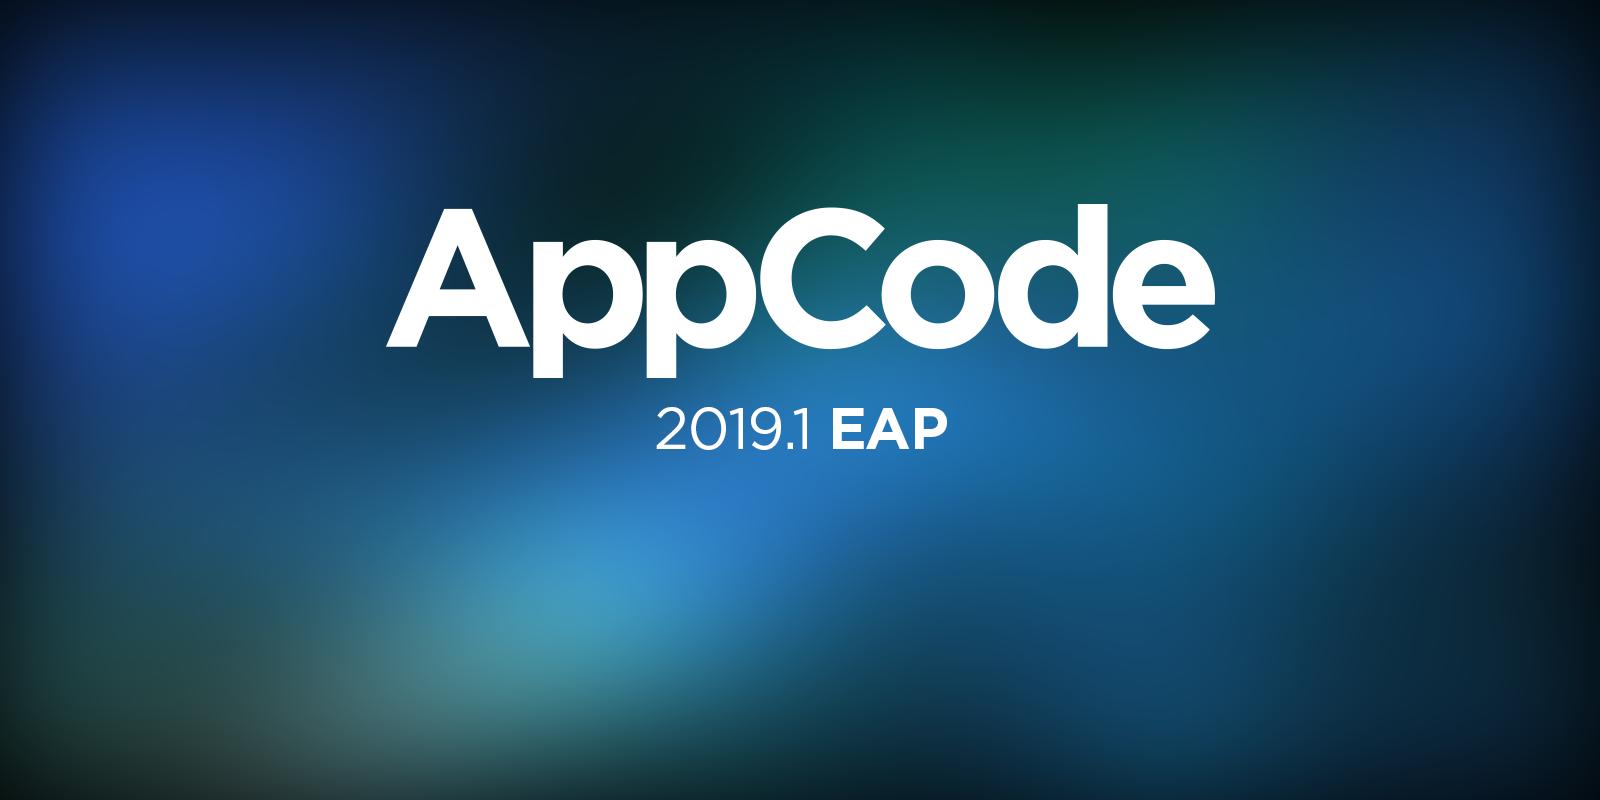 AppCode 2019.1 EAP